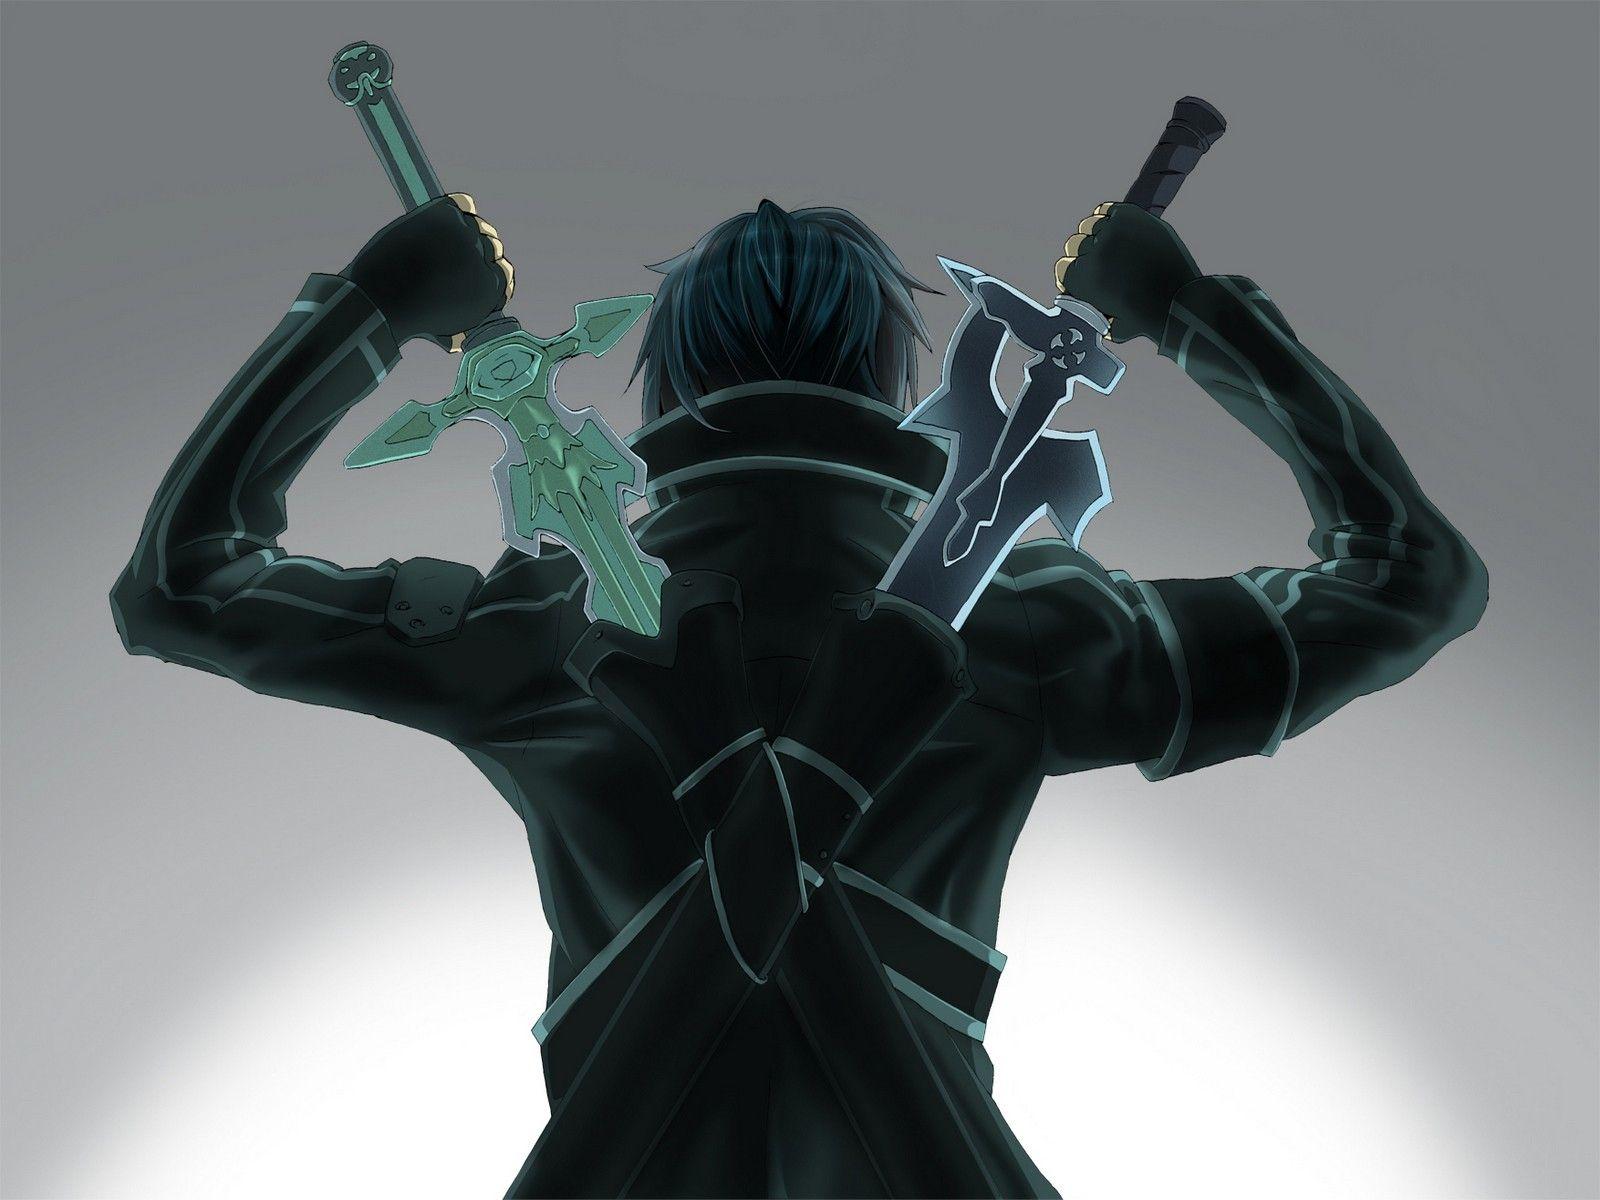 Fantasy Art Armor Anime Boy With Swords Kirigaya Kazuto